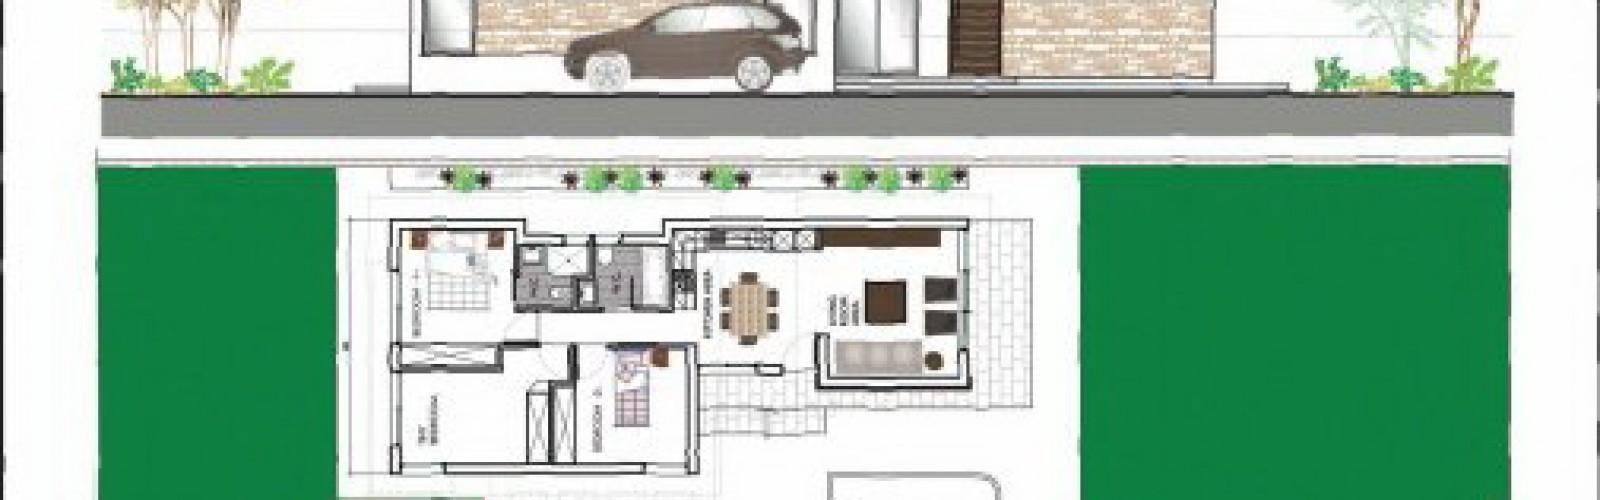 Three Bedroom Detached House